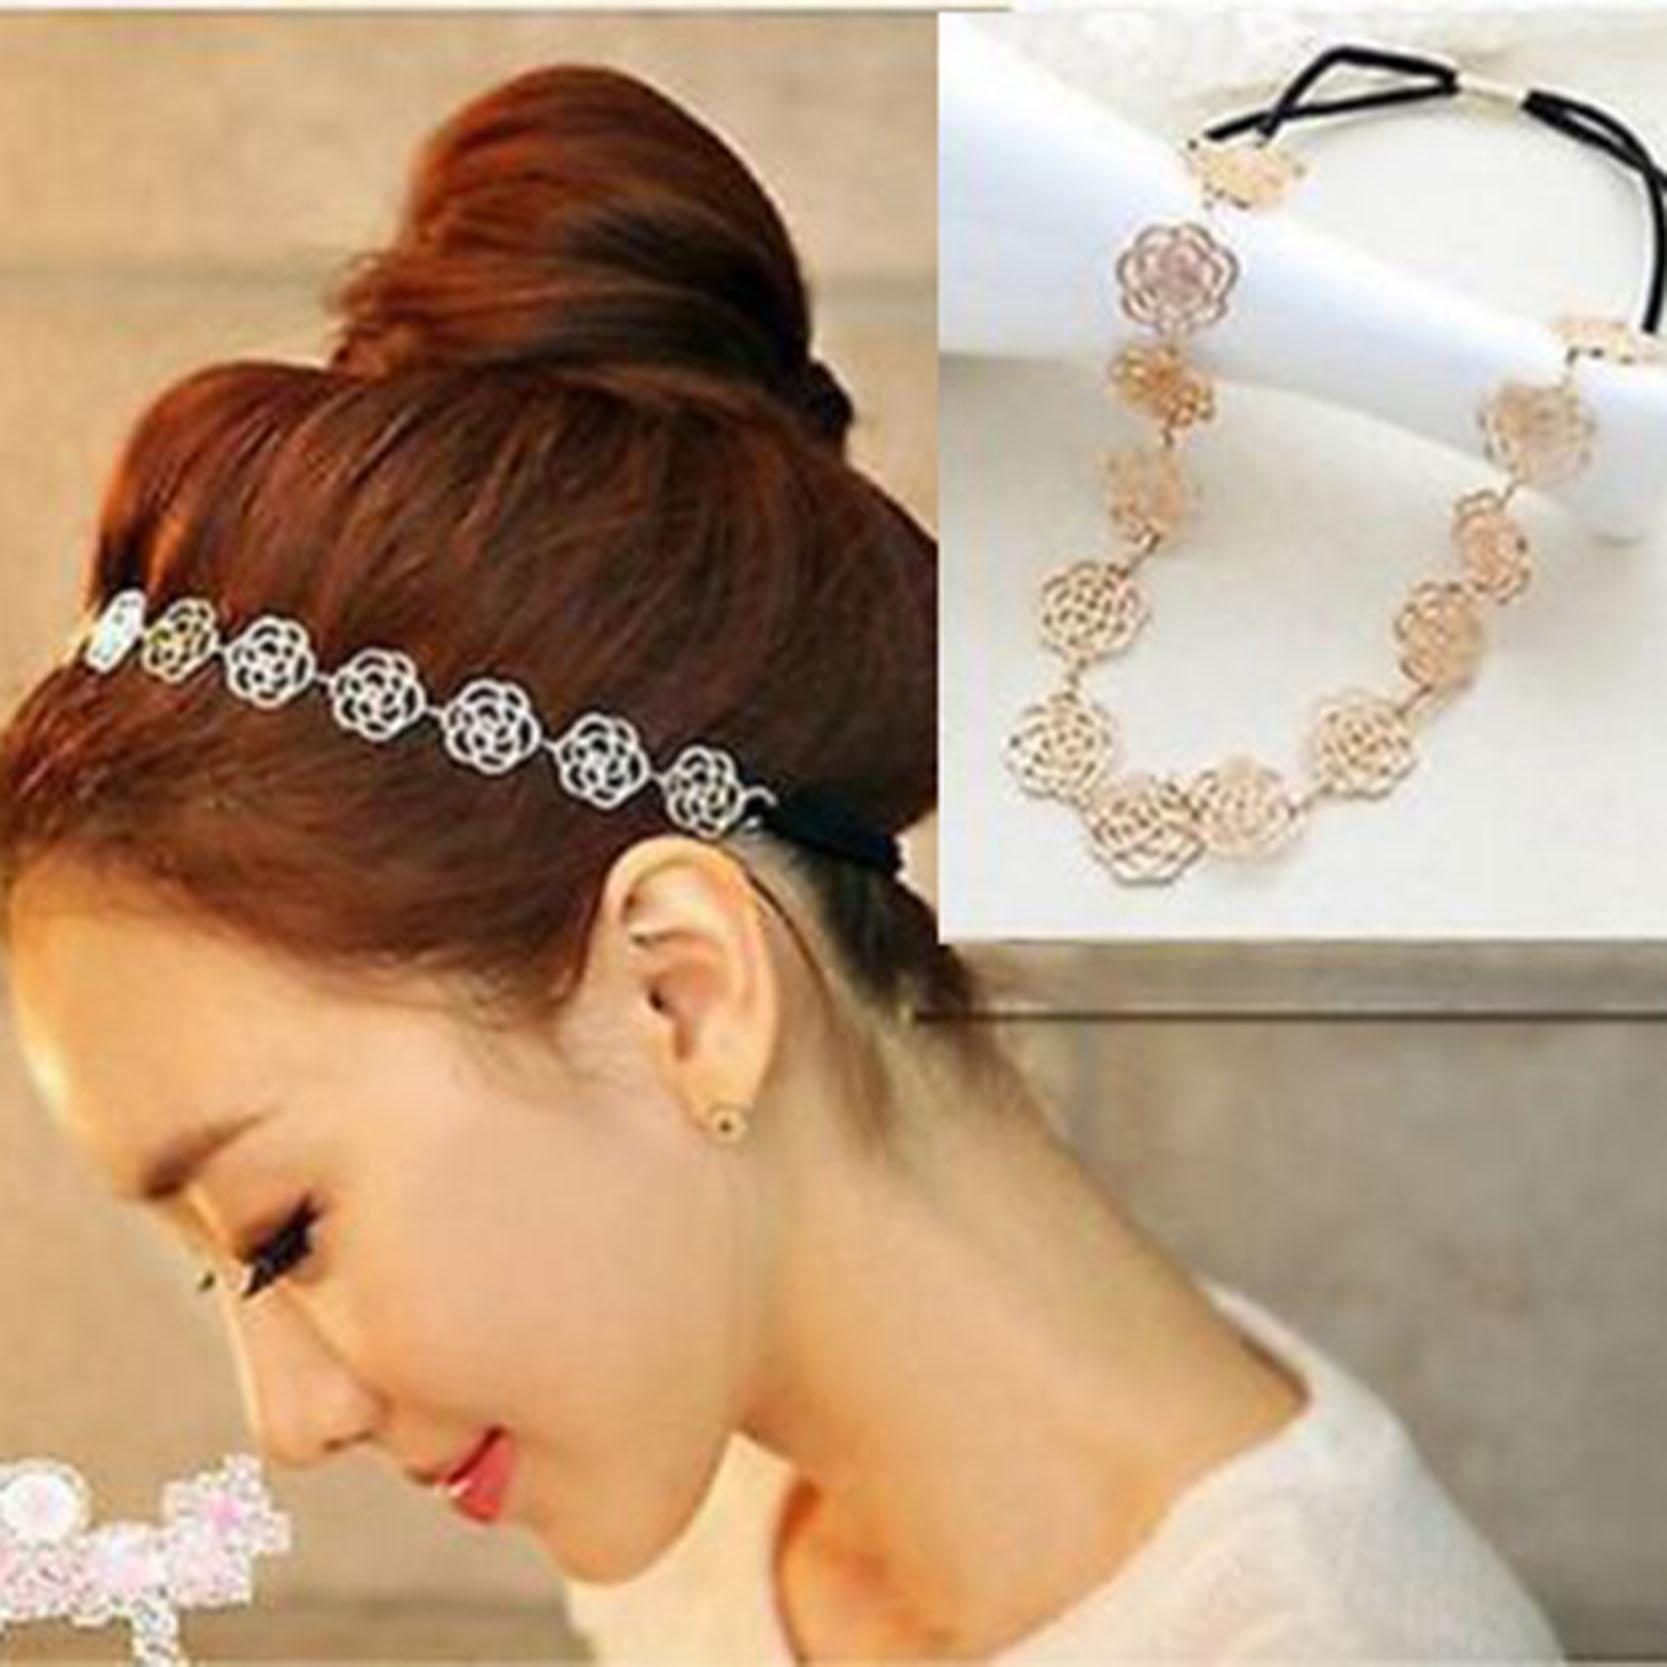 Fashion Women Rose Flower Design Hair Bands Headband Rubber Band